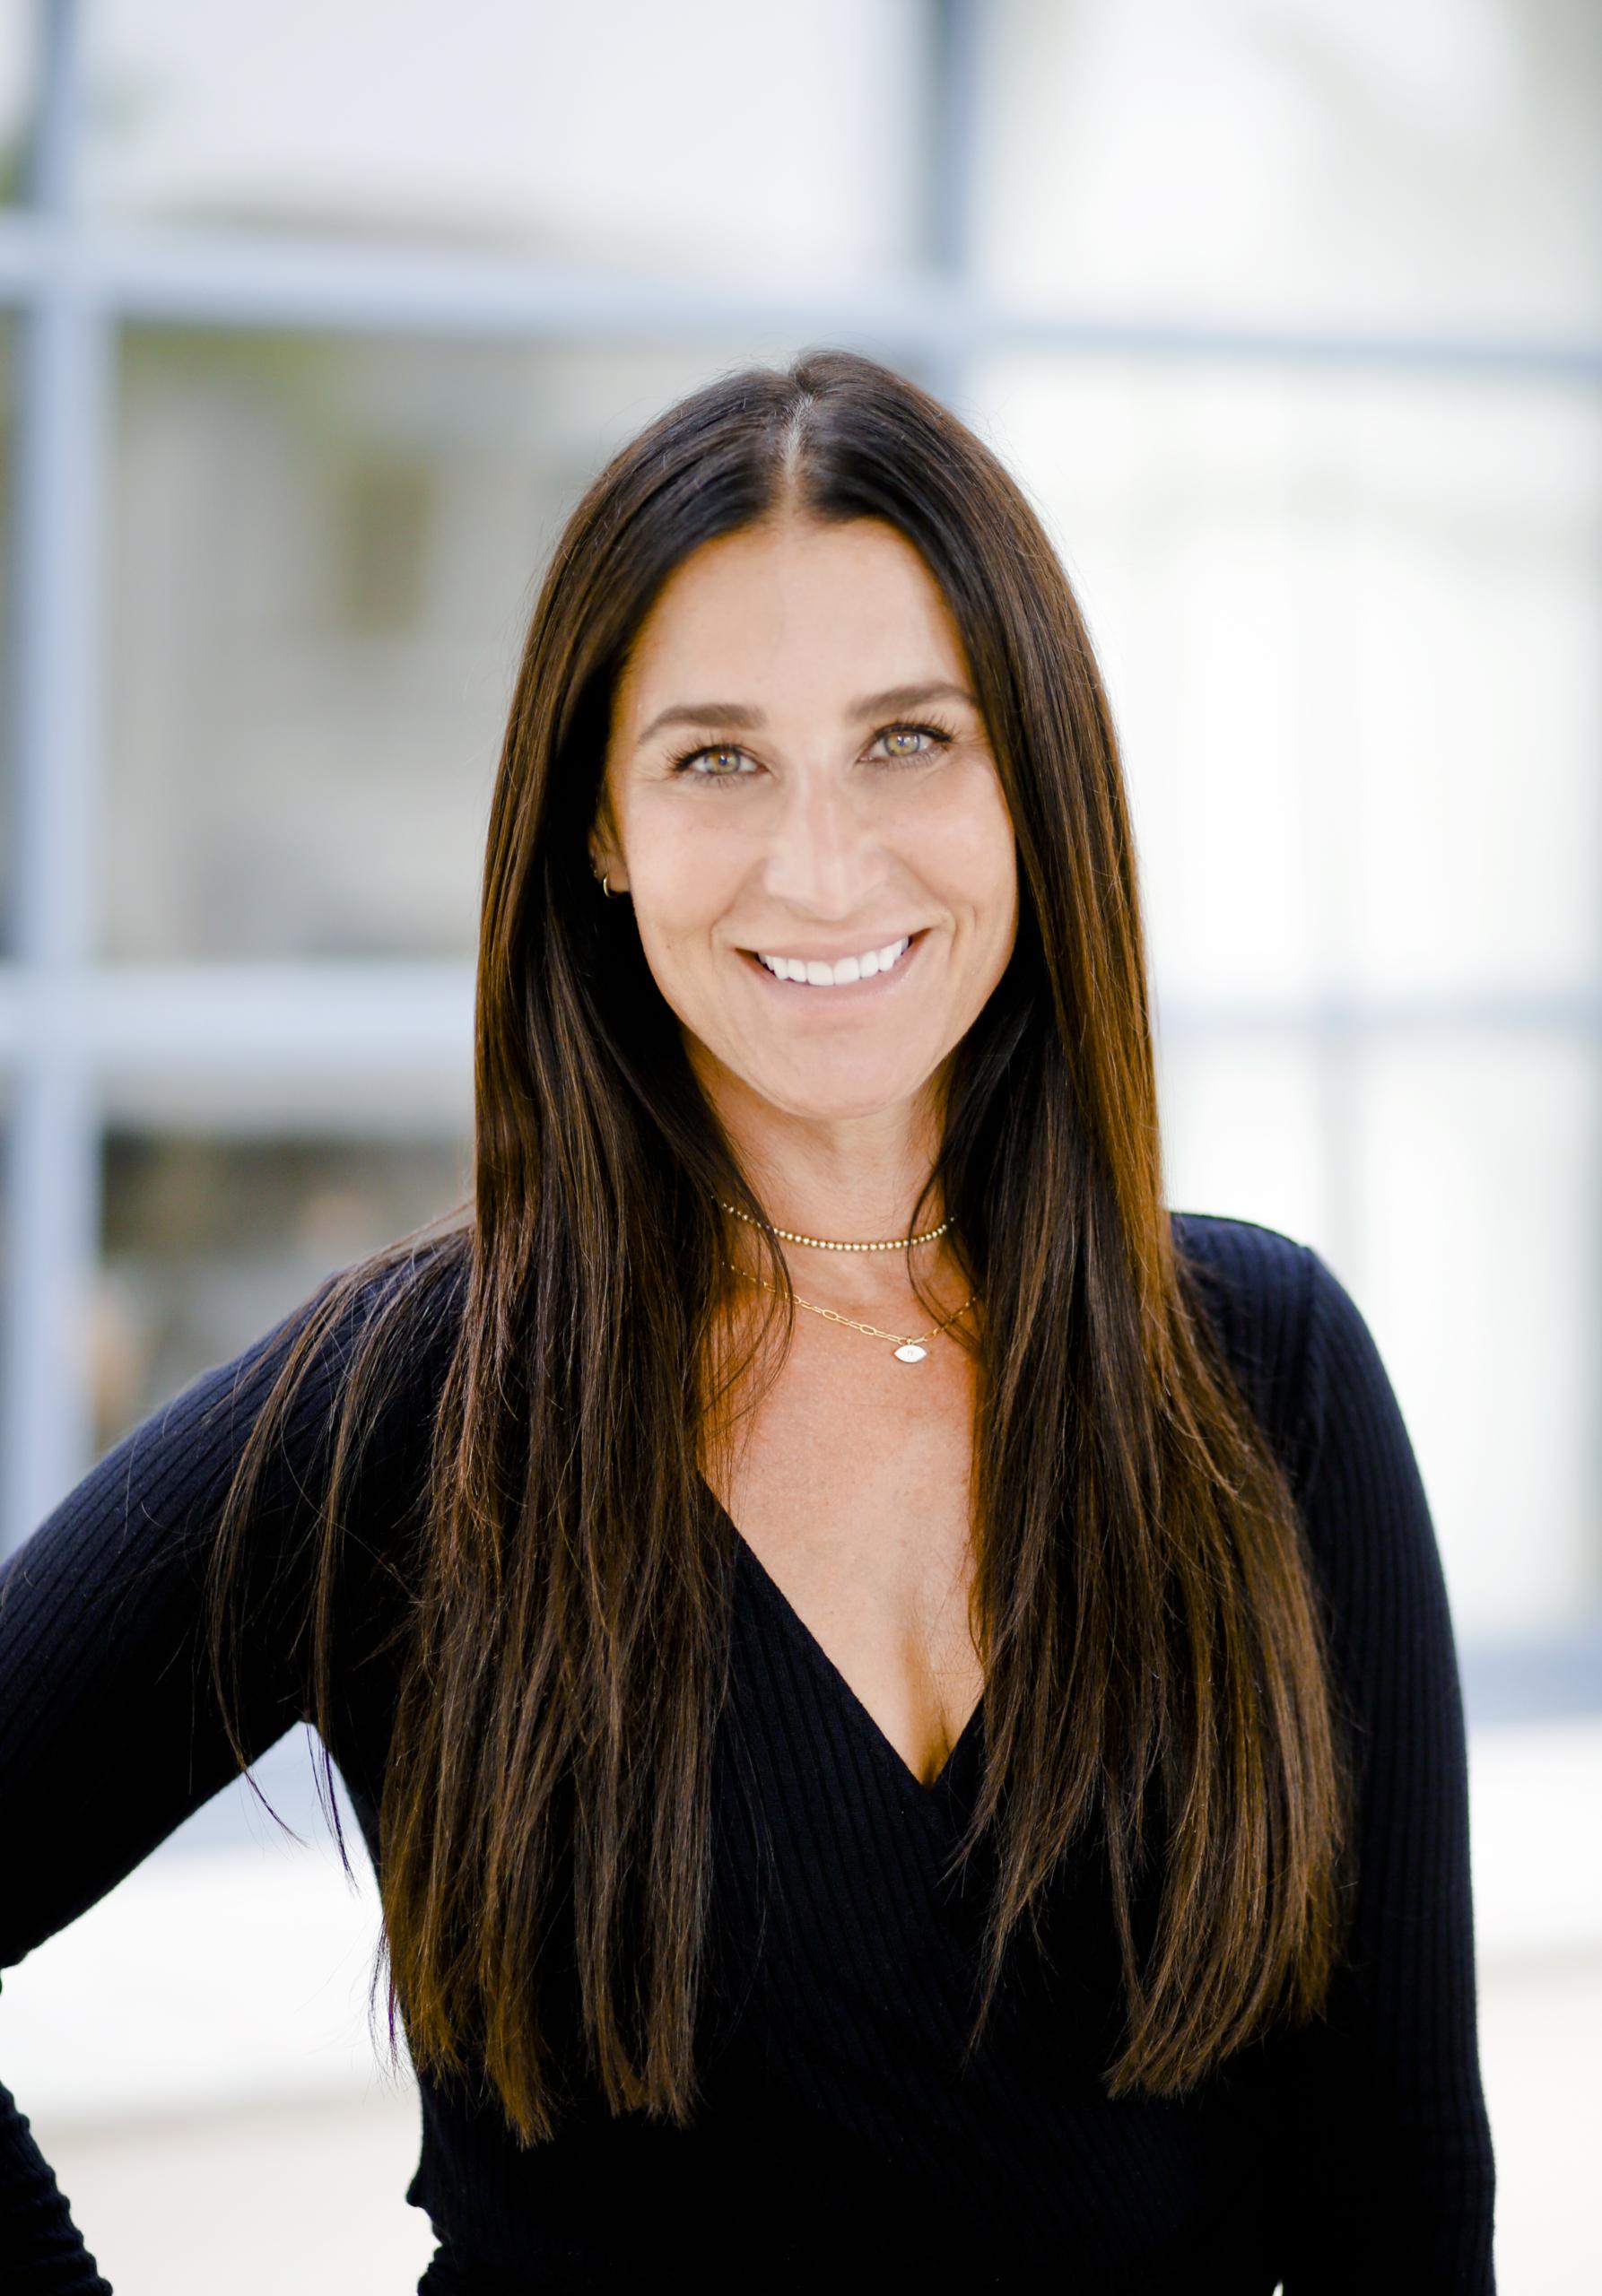 Stephanie Bostwick Owner & Esthetician